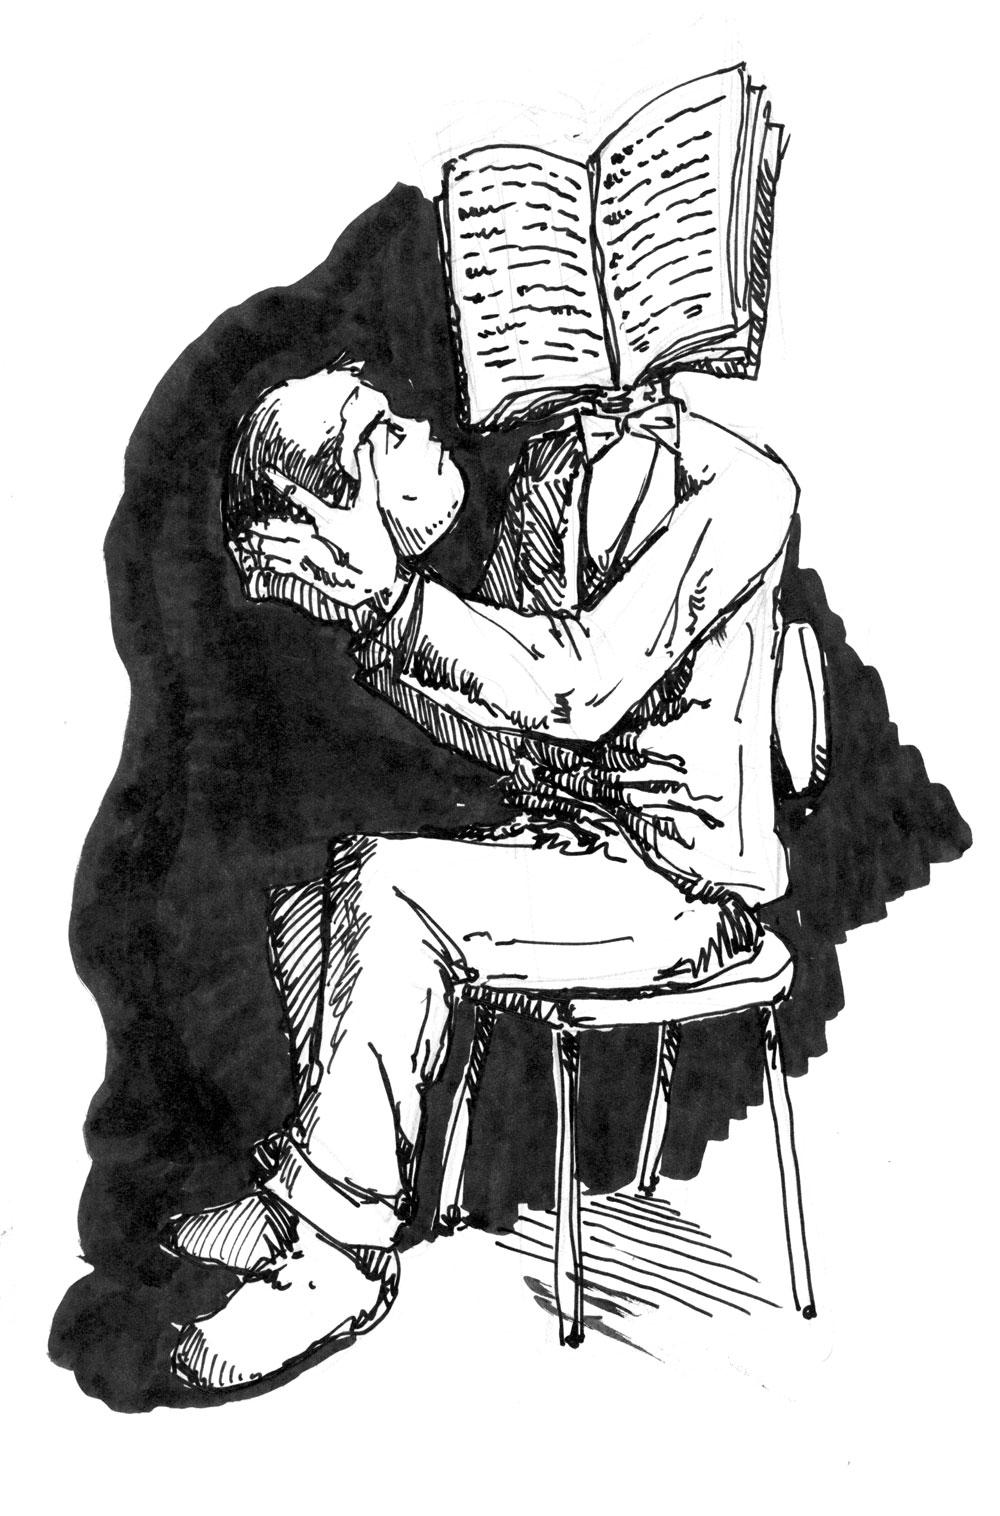 Book Illustration Friday